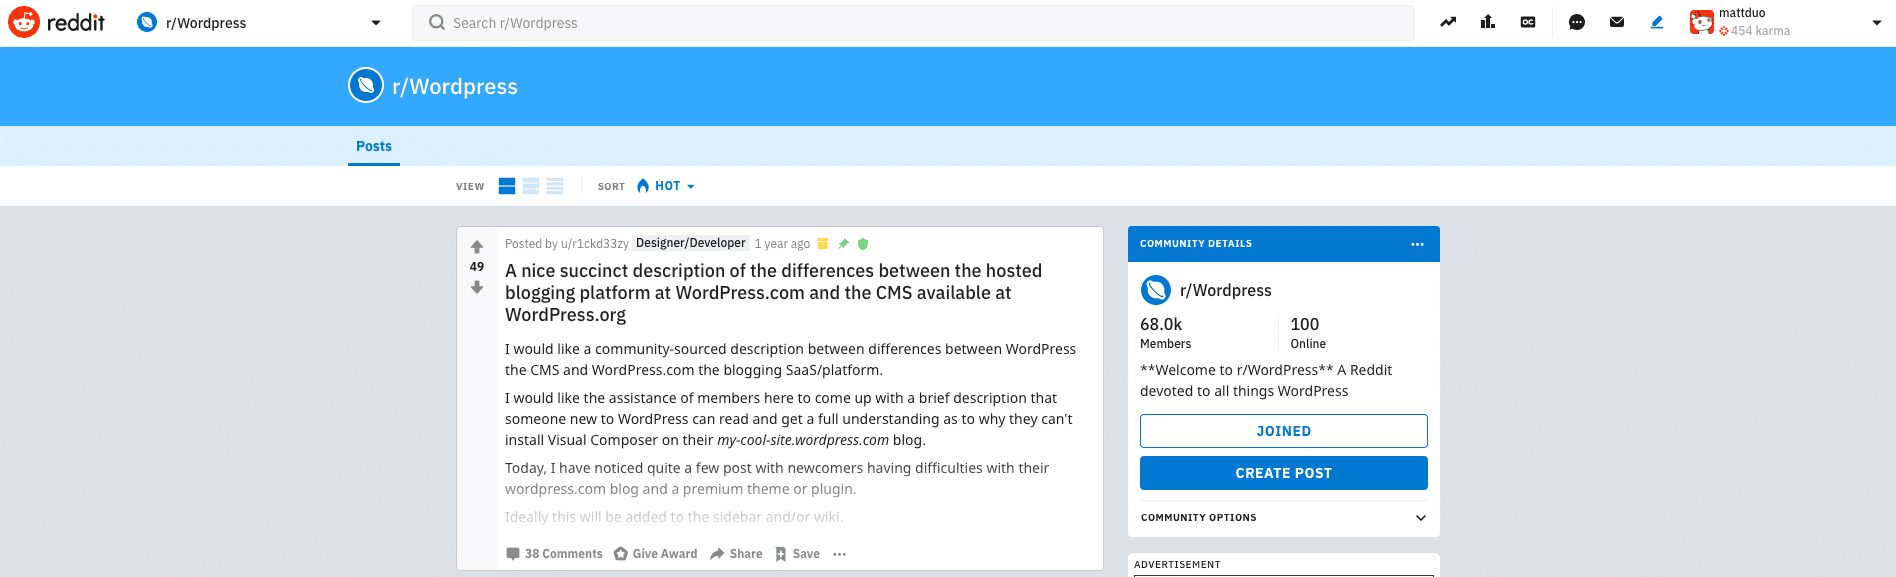 WordPress su Reddit